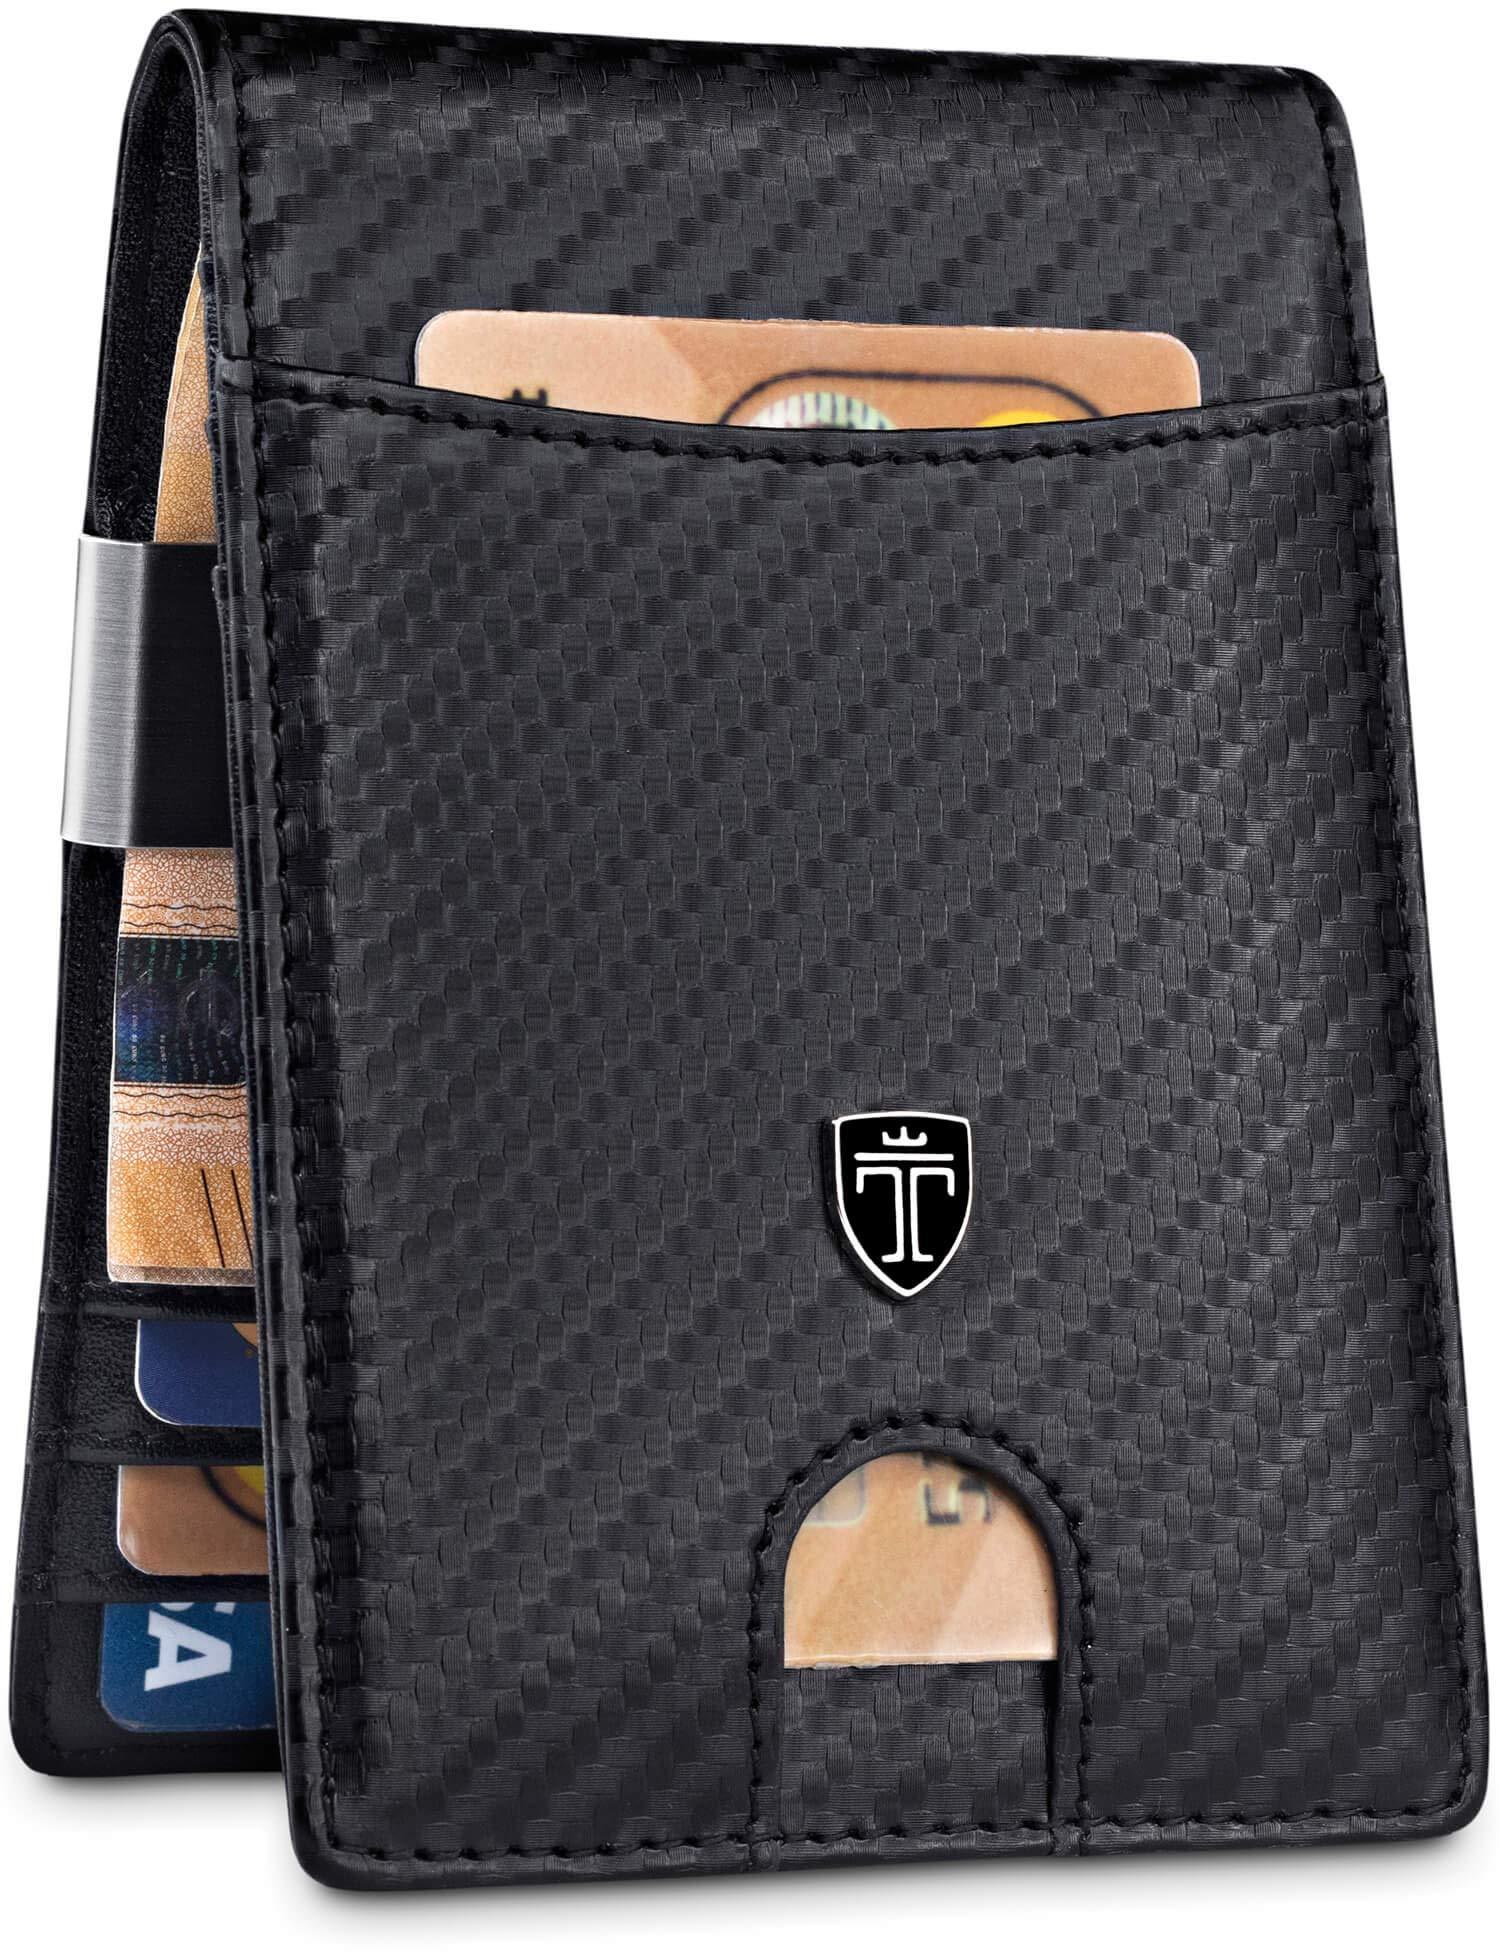 TRAVANDO Money Clip Wallet''RIO'' Mens Wallet Front Pocket Wallet Slim Wallet RFID Blocking | Credit Card Holder | Minimalist Mini Bifold Gifts for Men (Carbon) by TRAVANDO